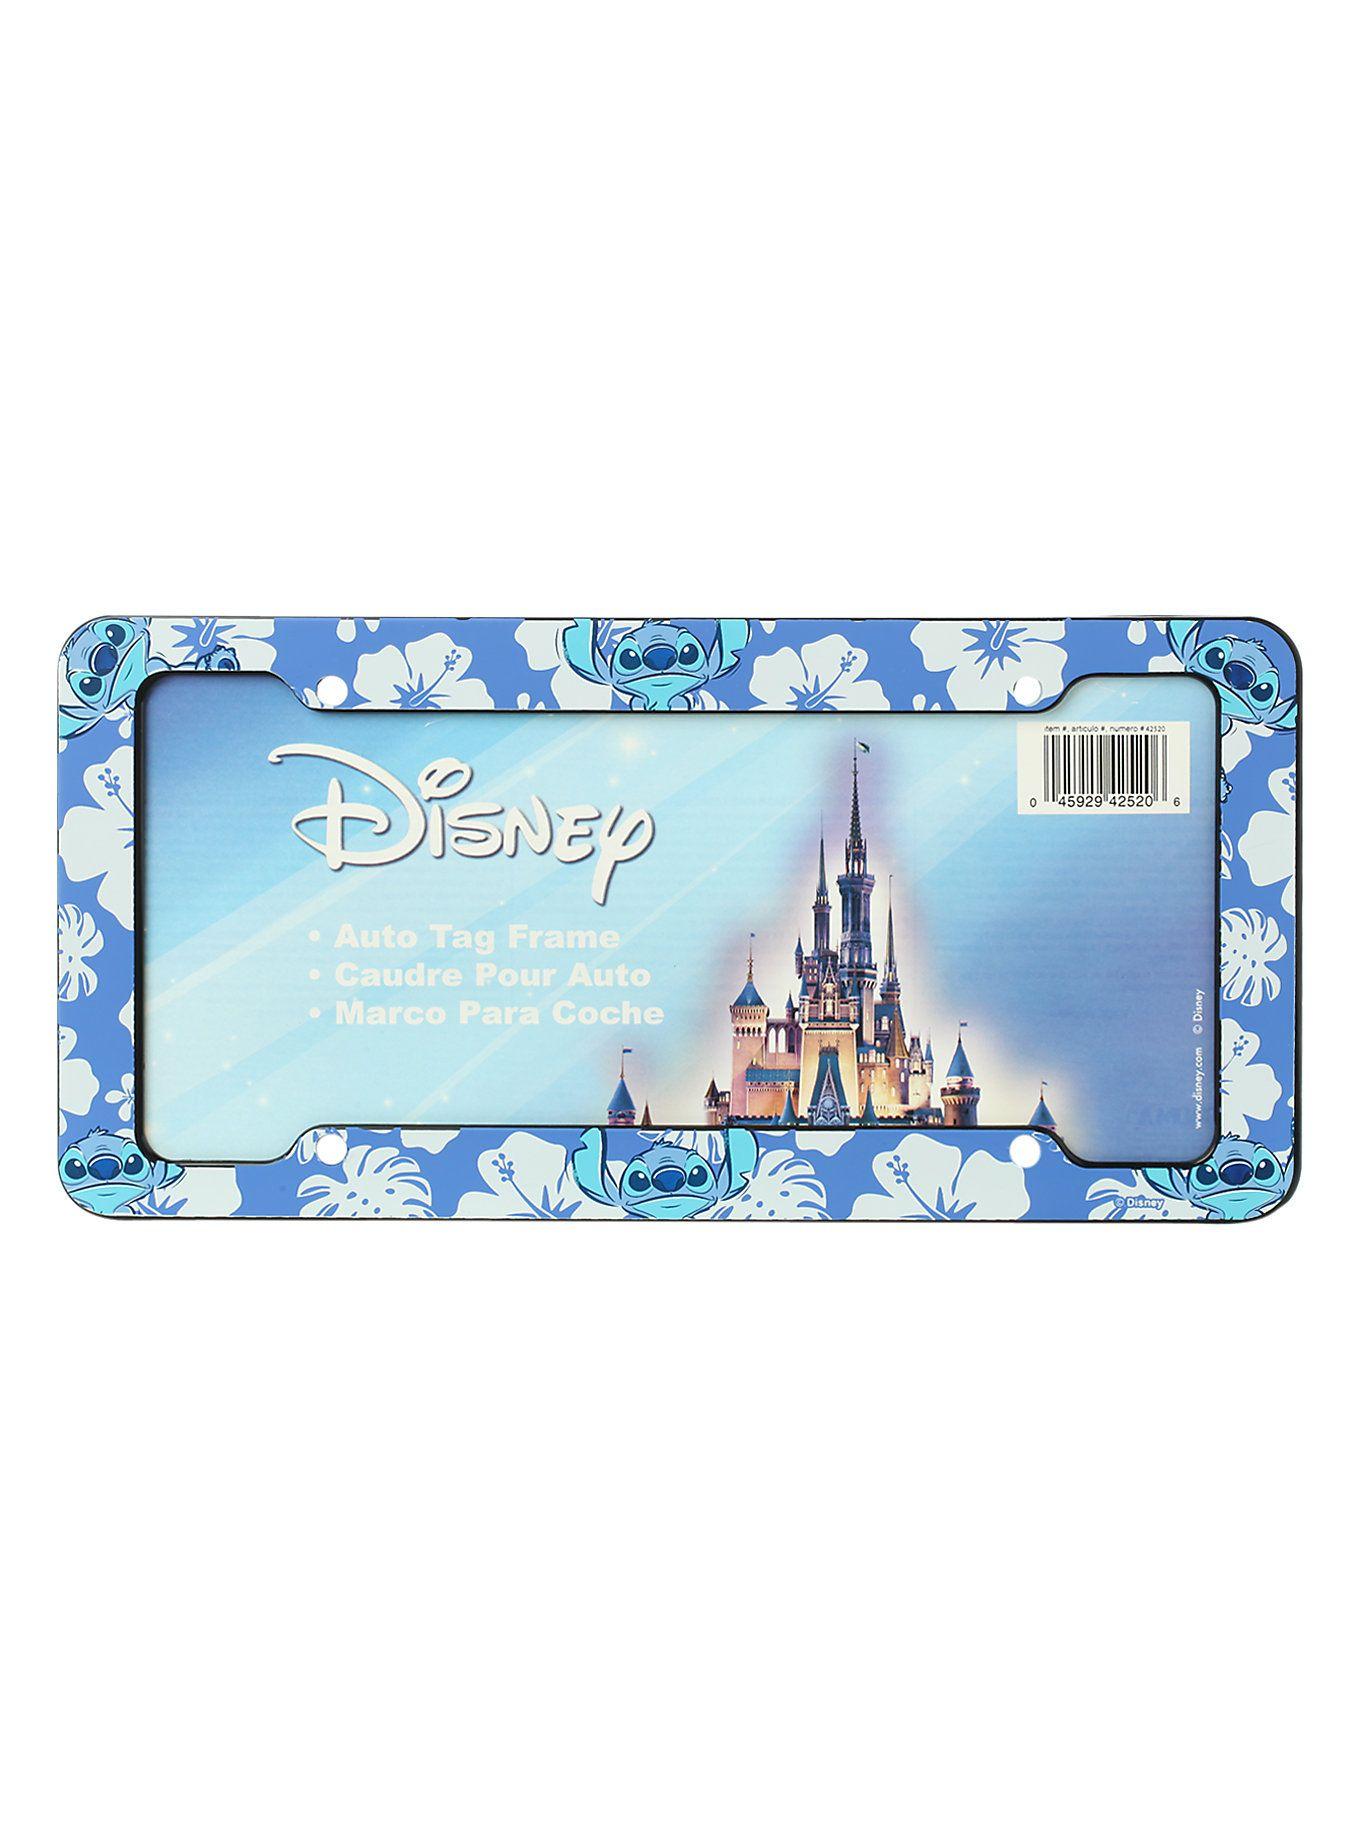 disney lilo stitch license plate frame - Mermaid License Plate Frame